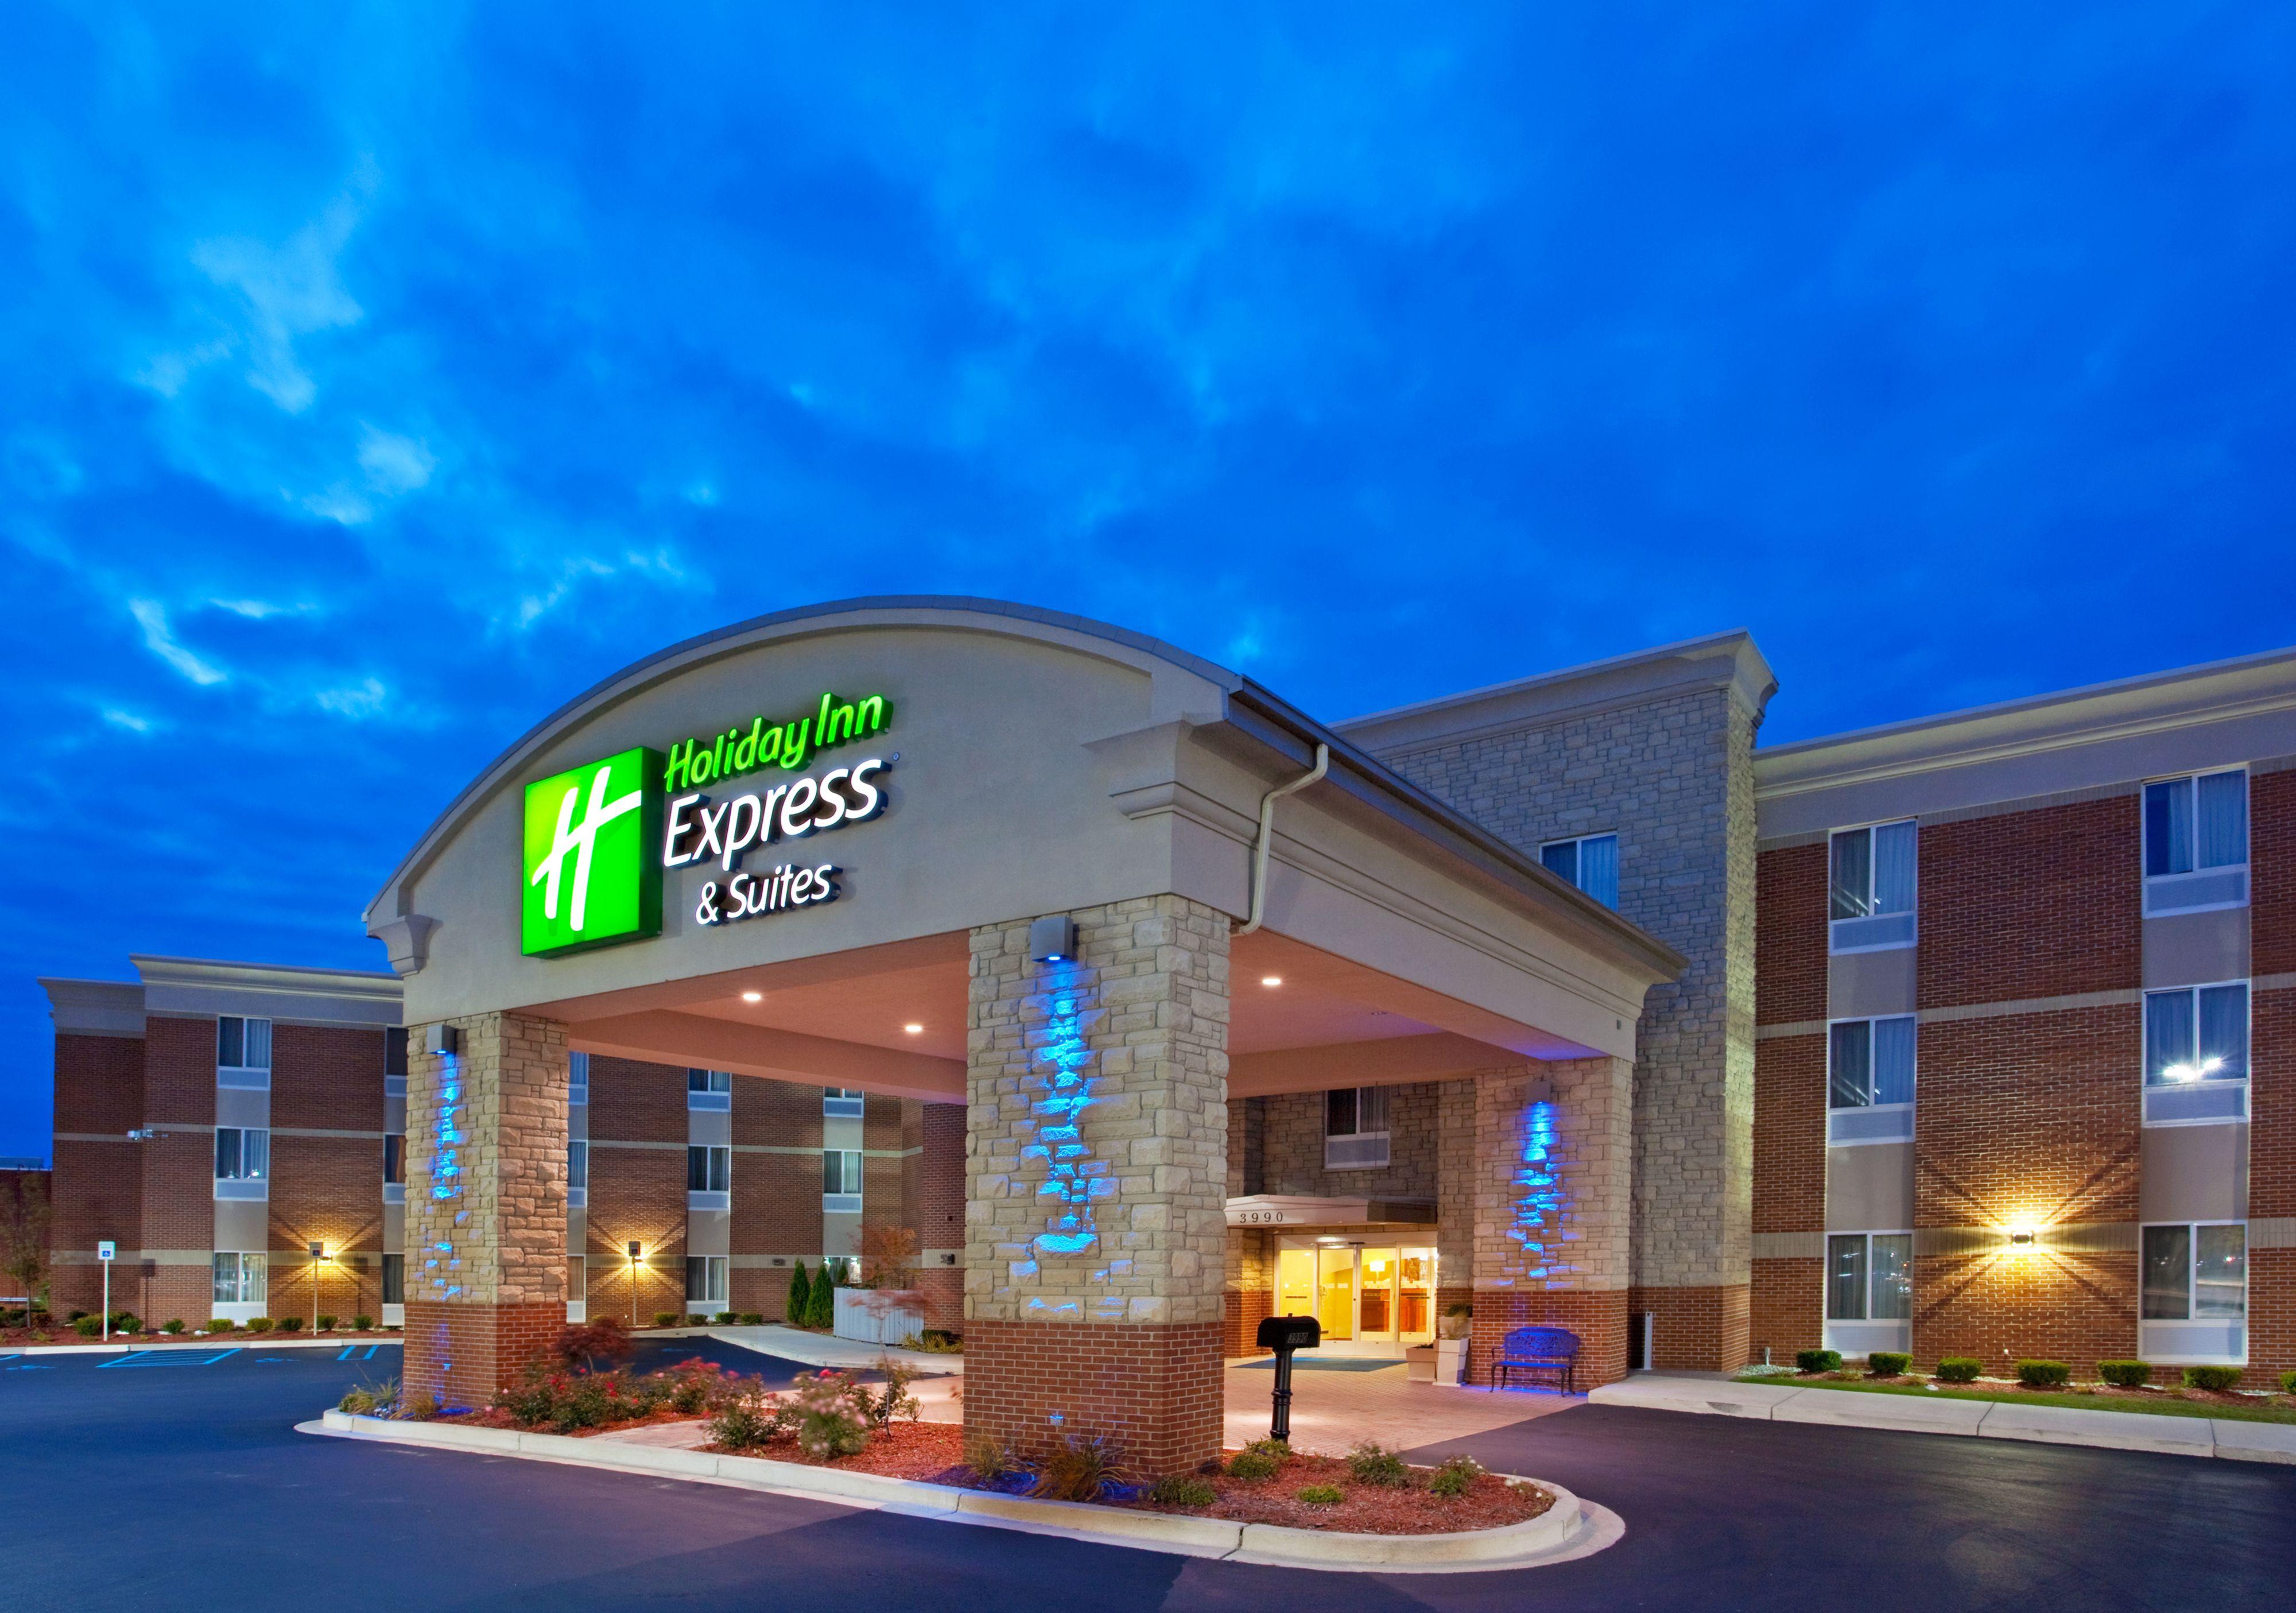 Holiday Inn Express & Suites Auburn image 3